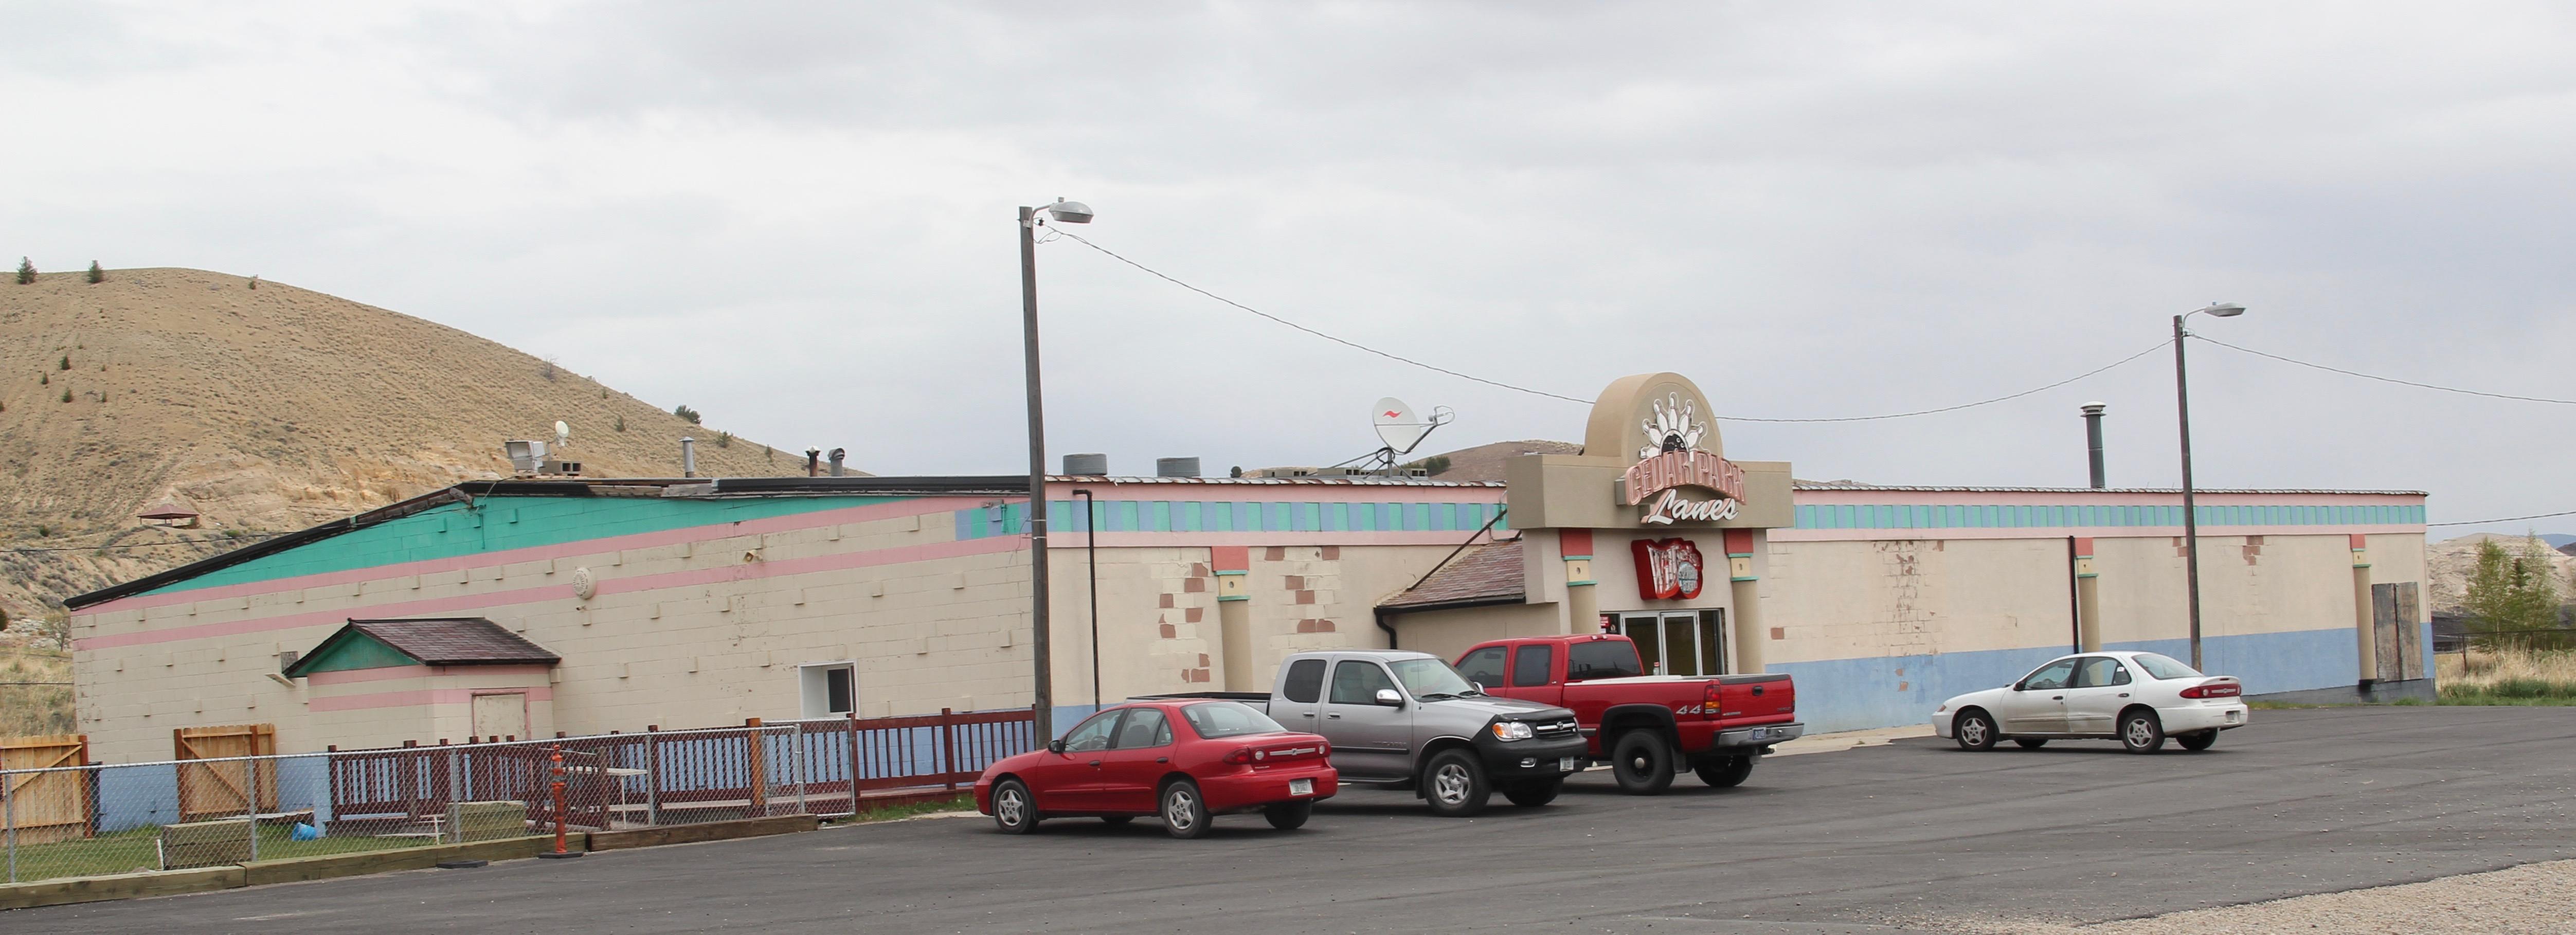 Cedar Park Bowling Lanes, N side